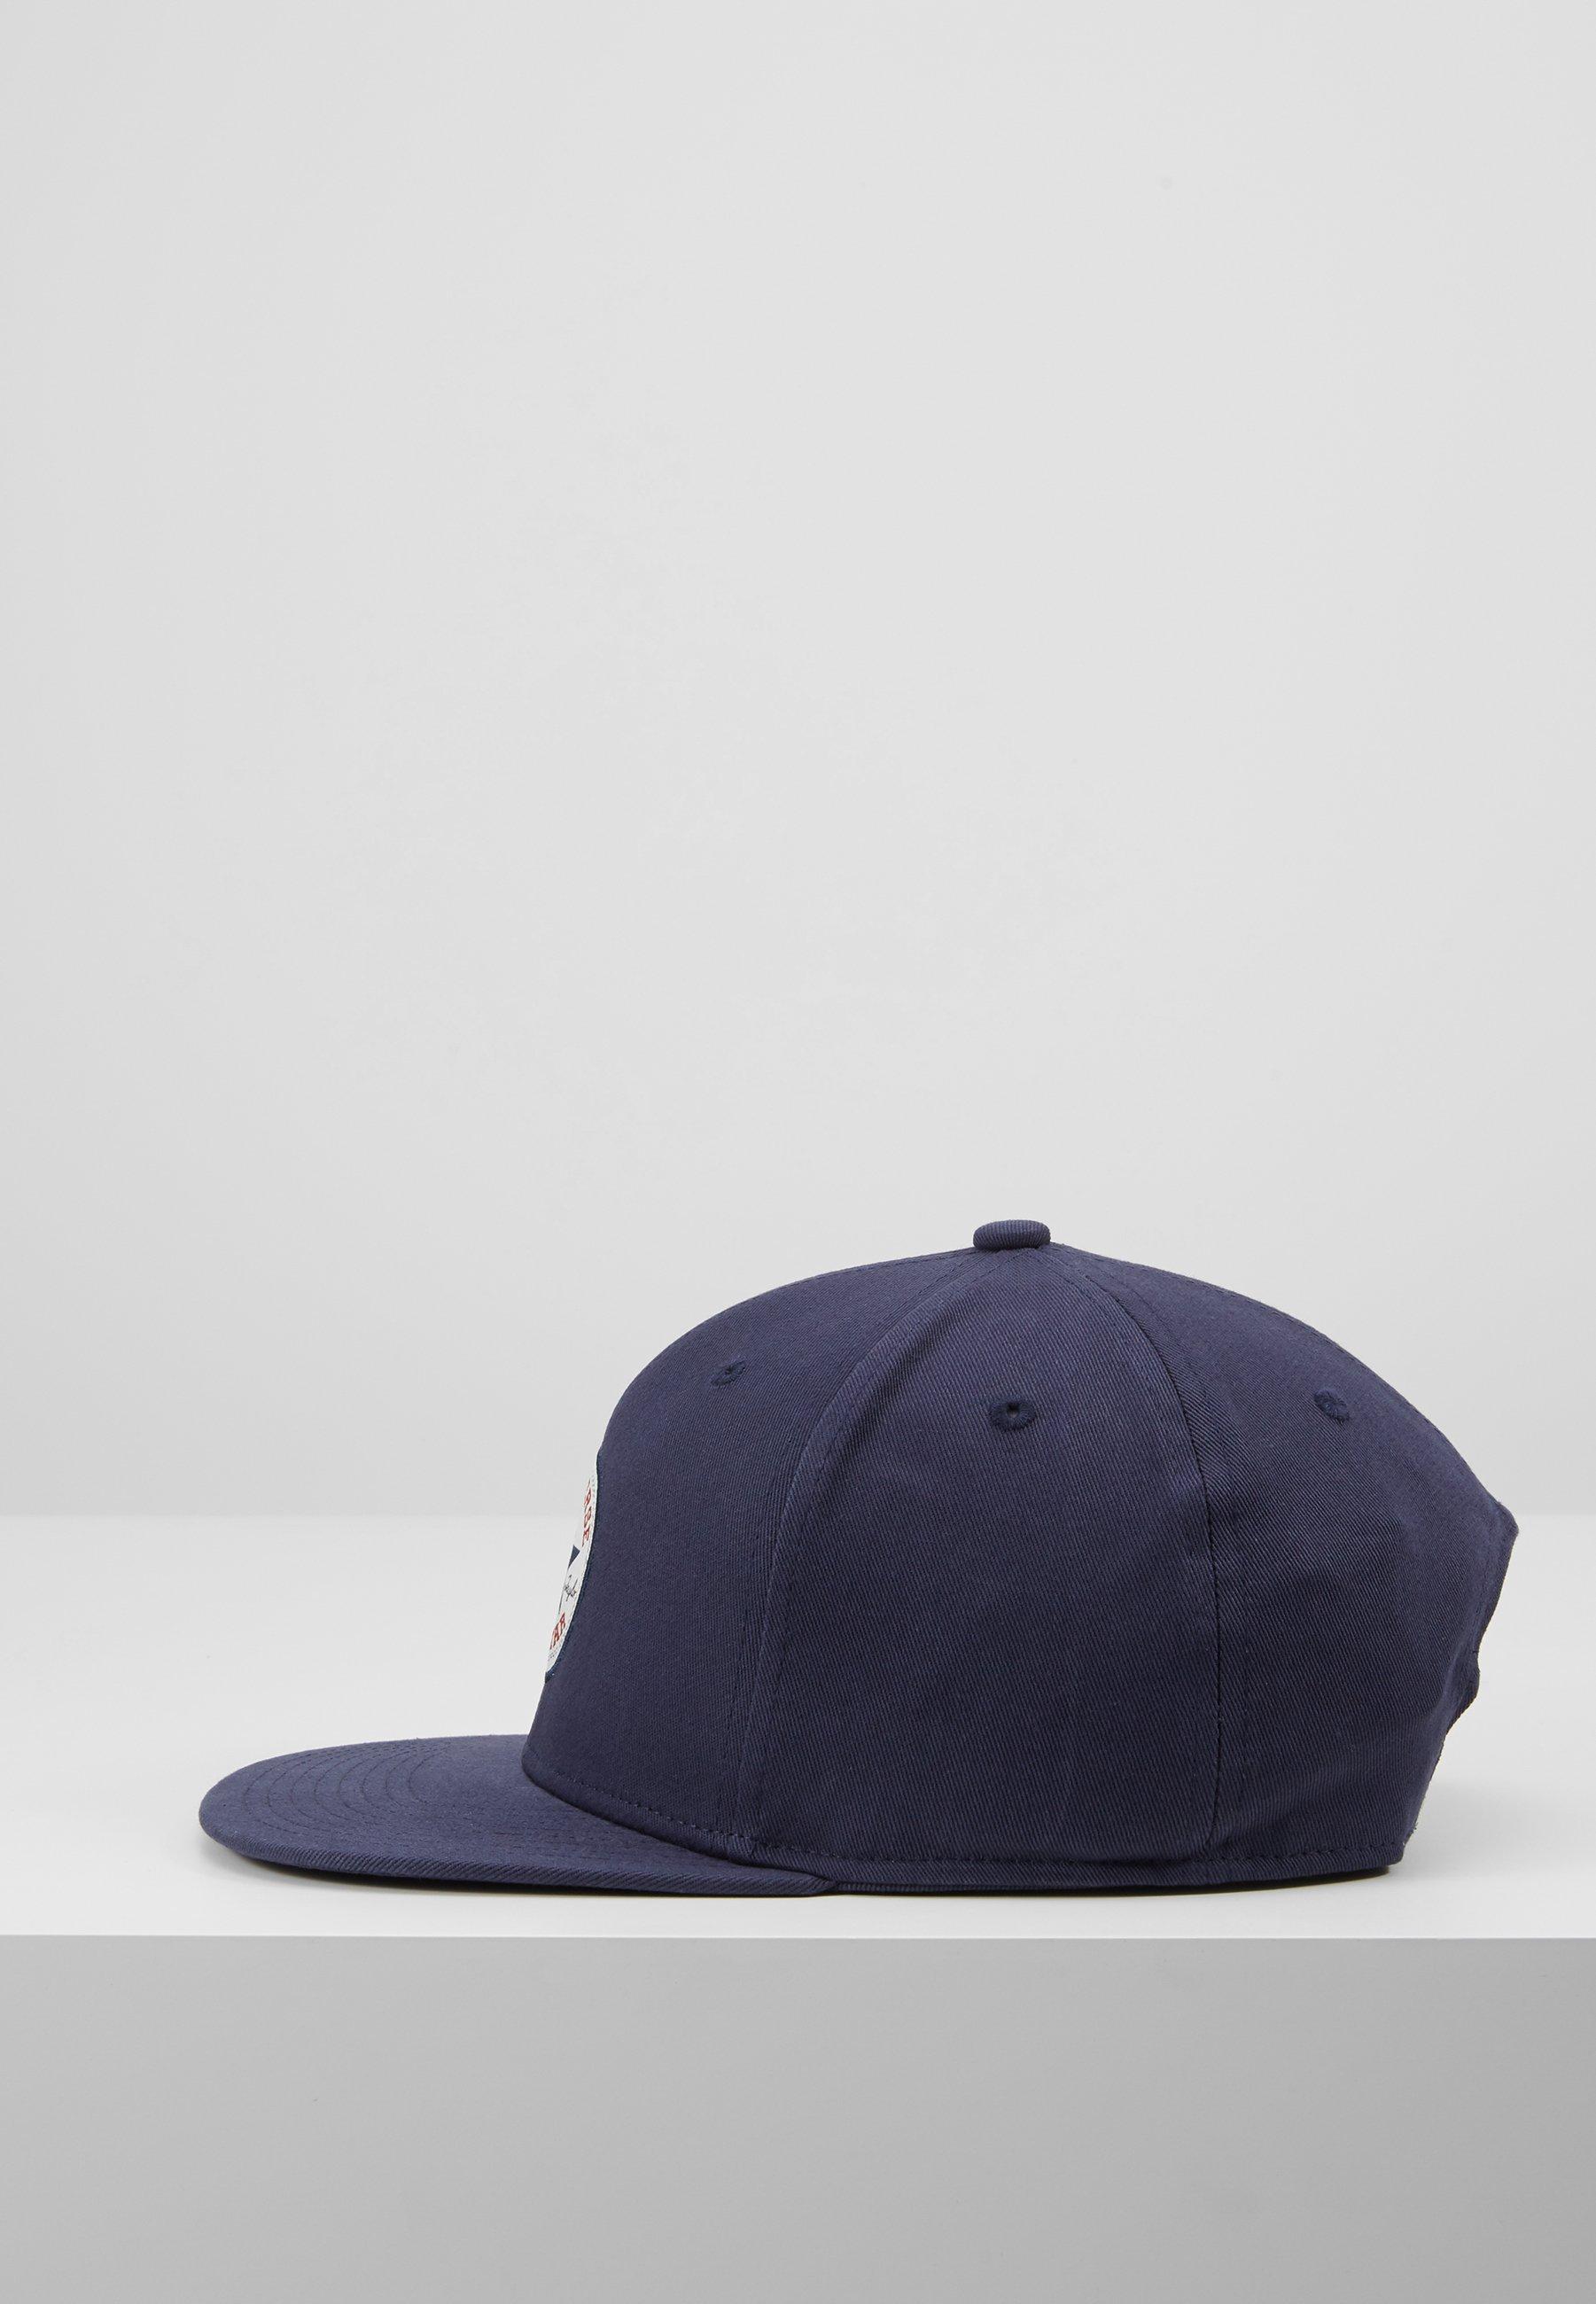 Converse CTLOGO SNAPBACK - Cap - navy/mørkeblå tnKKVGlaUHyFqHP